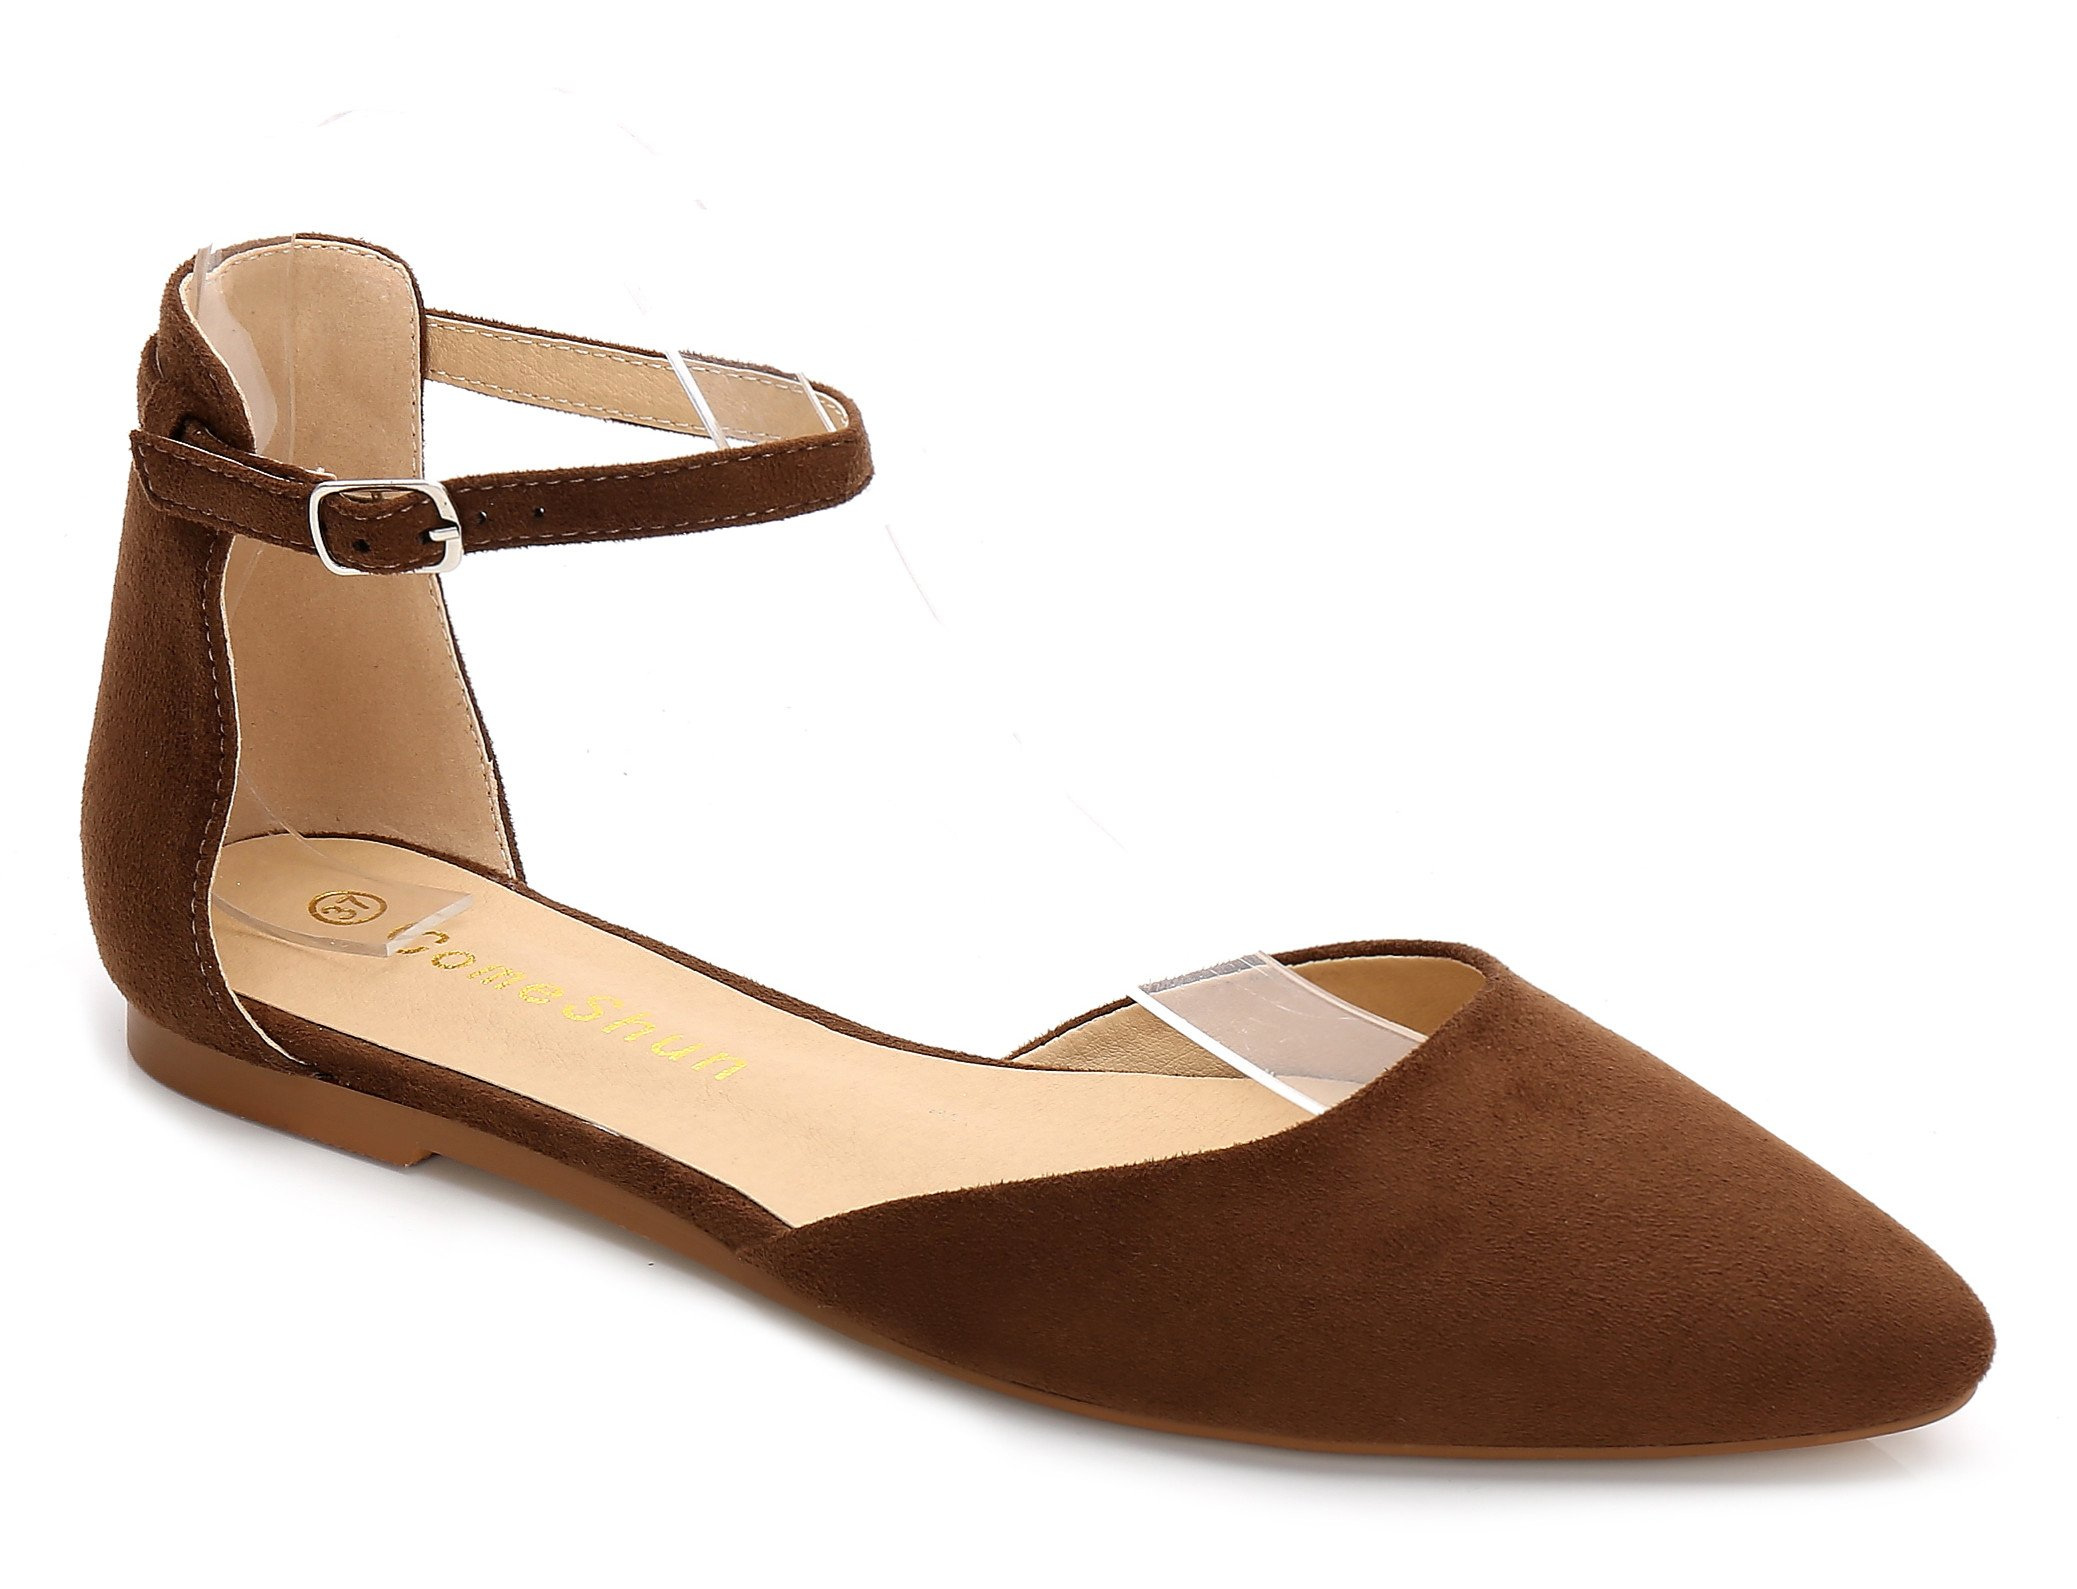 ComeShun Womens Shoes Brown Comfort Flats Classic D'Orsay Dress Slingback Pump Size 5